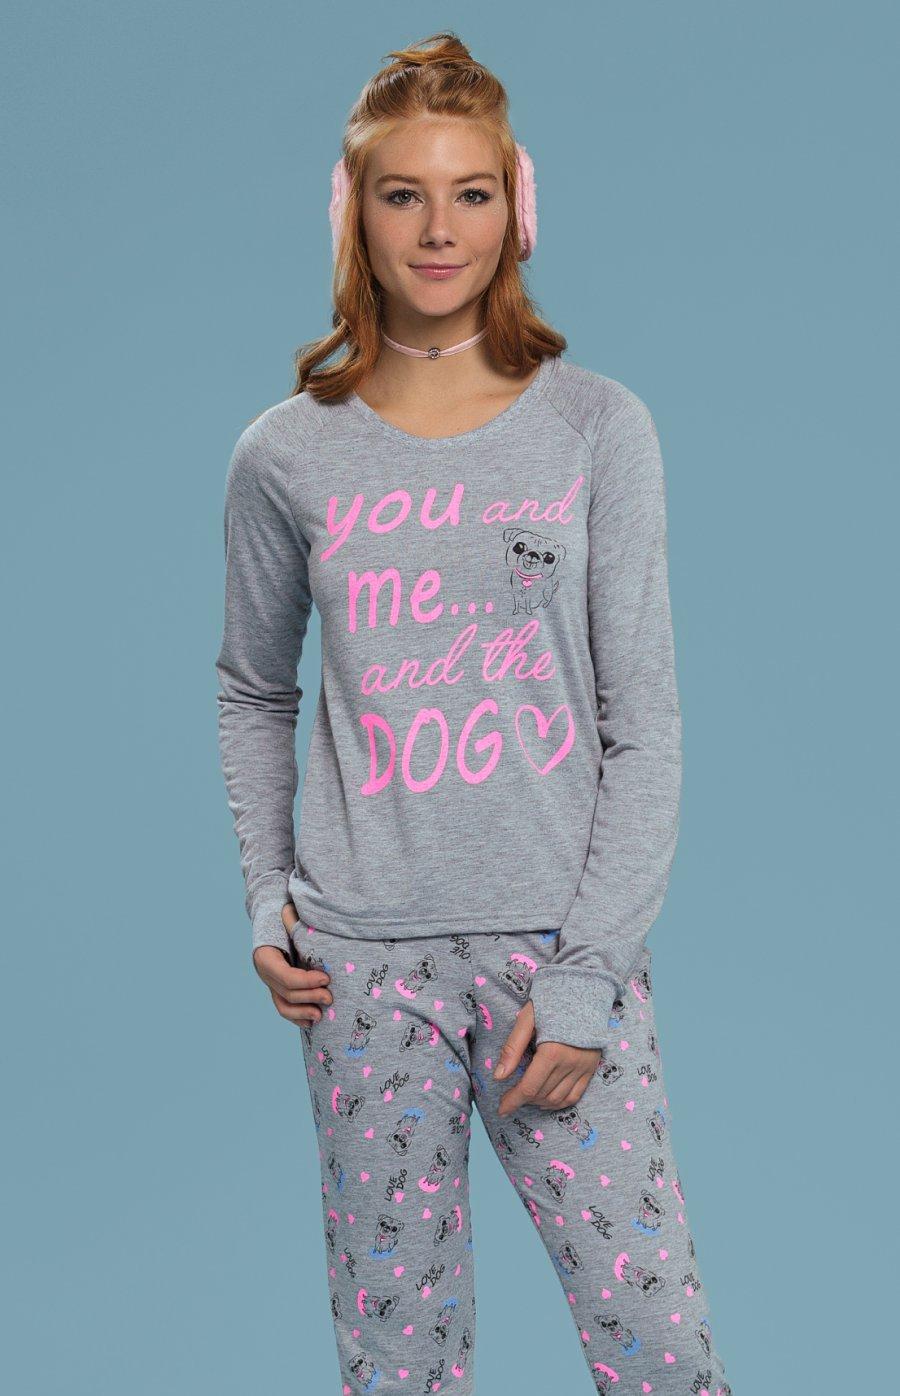 Pijama Moletinho Silly Dog PROMO Inverno 2018